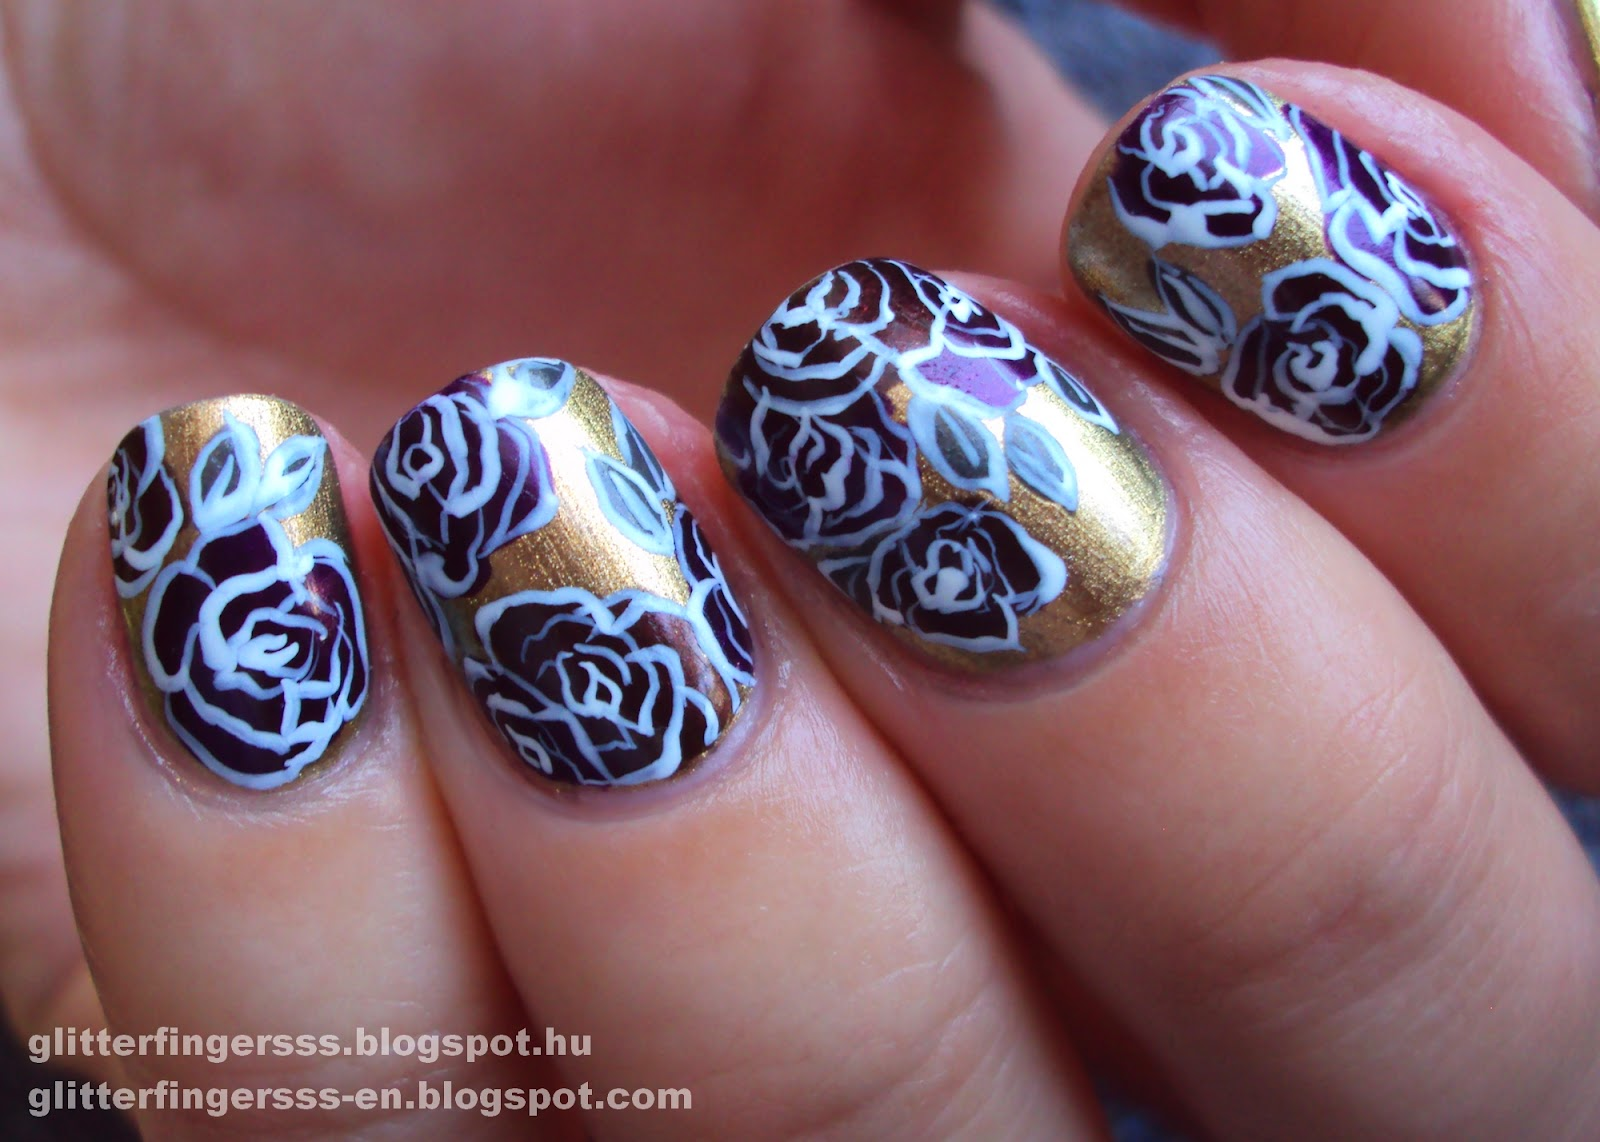 Nail Art Baroque Roses Glitterfingersss In English